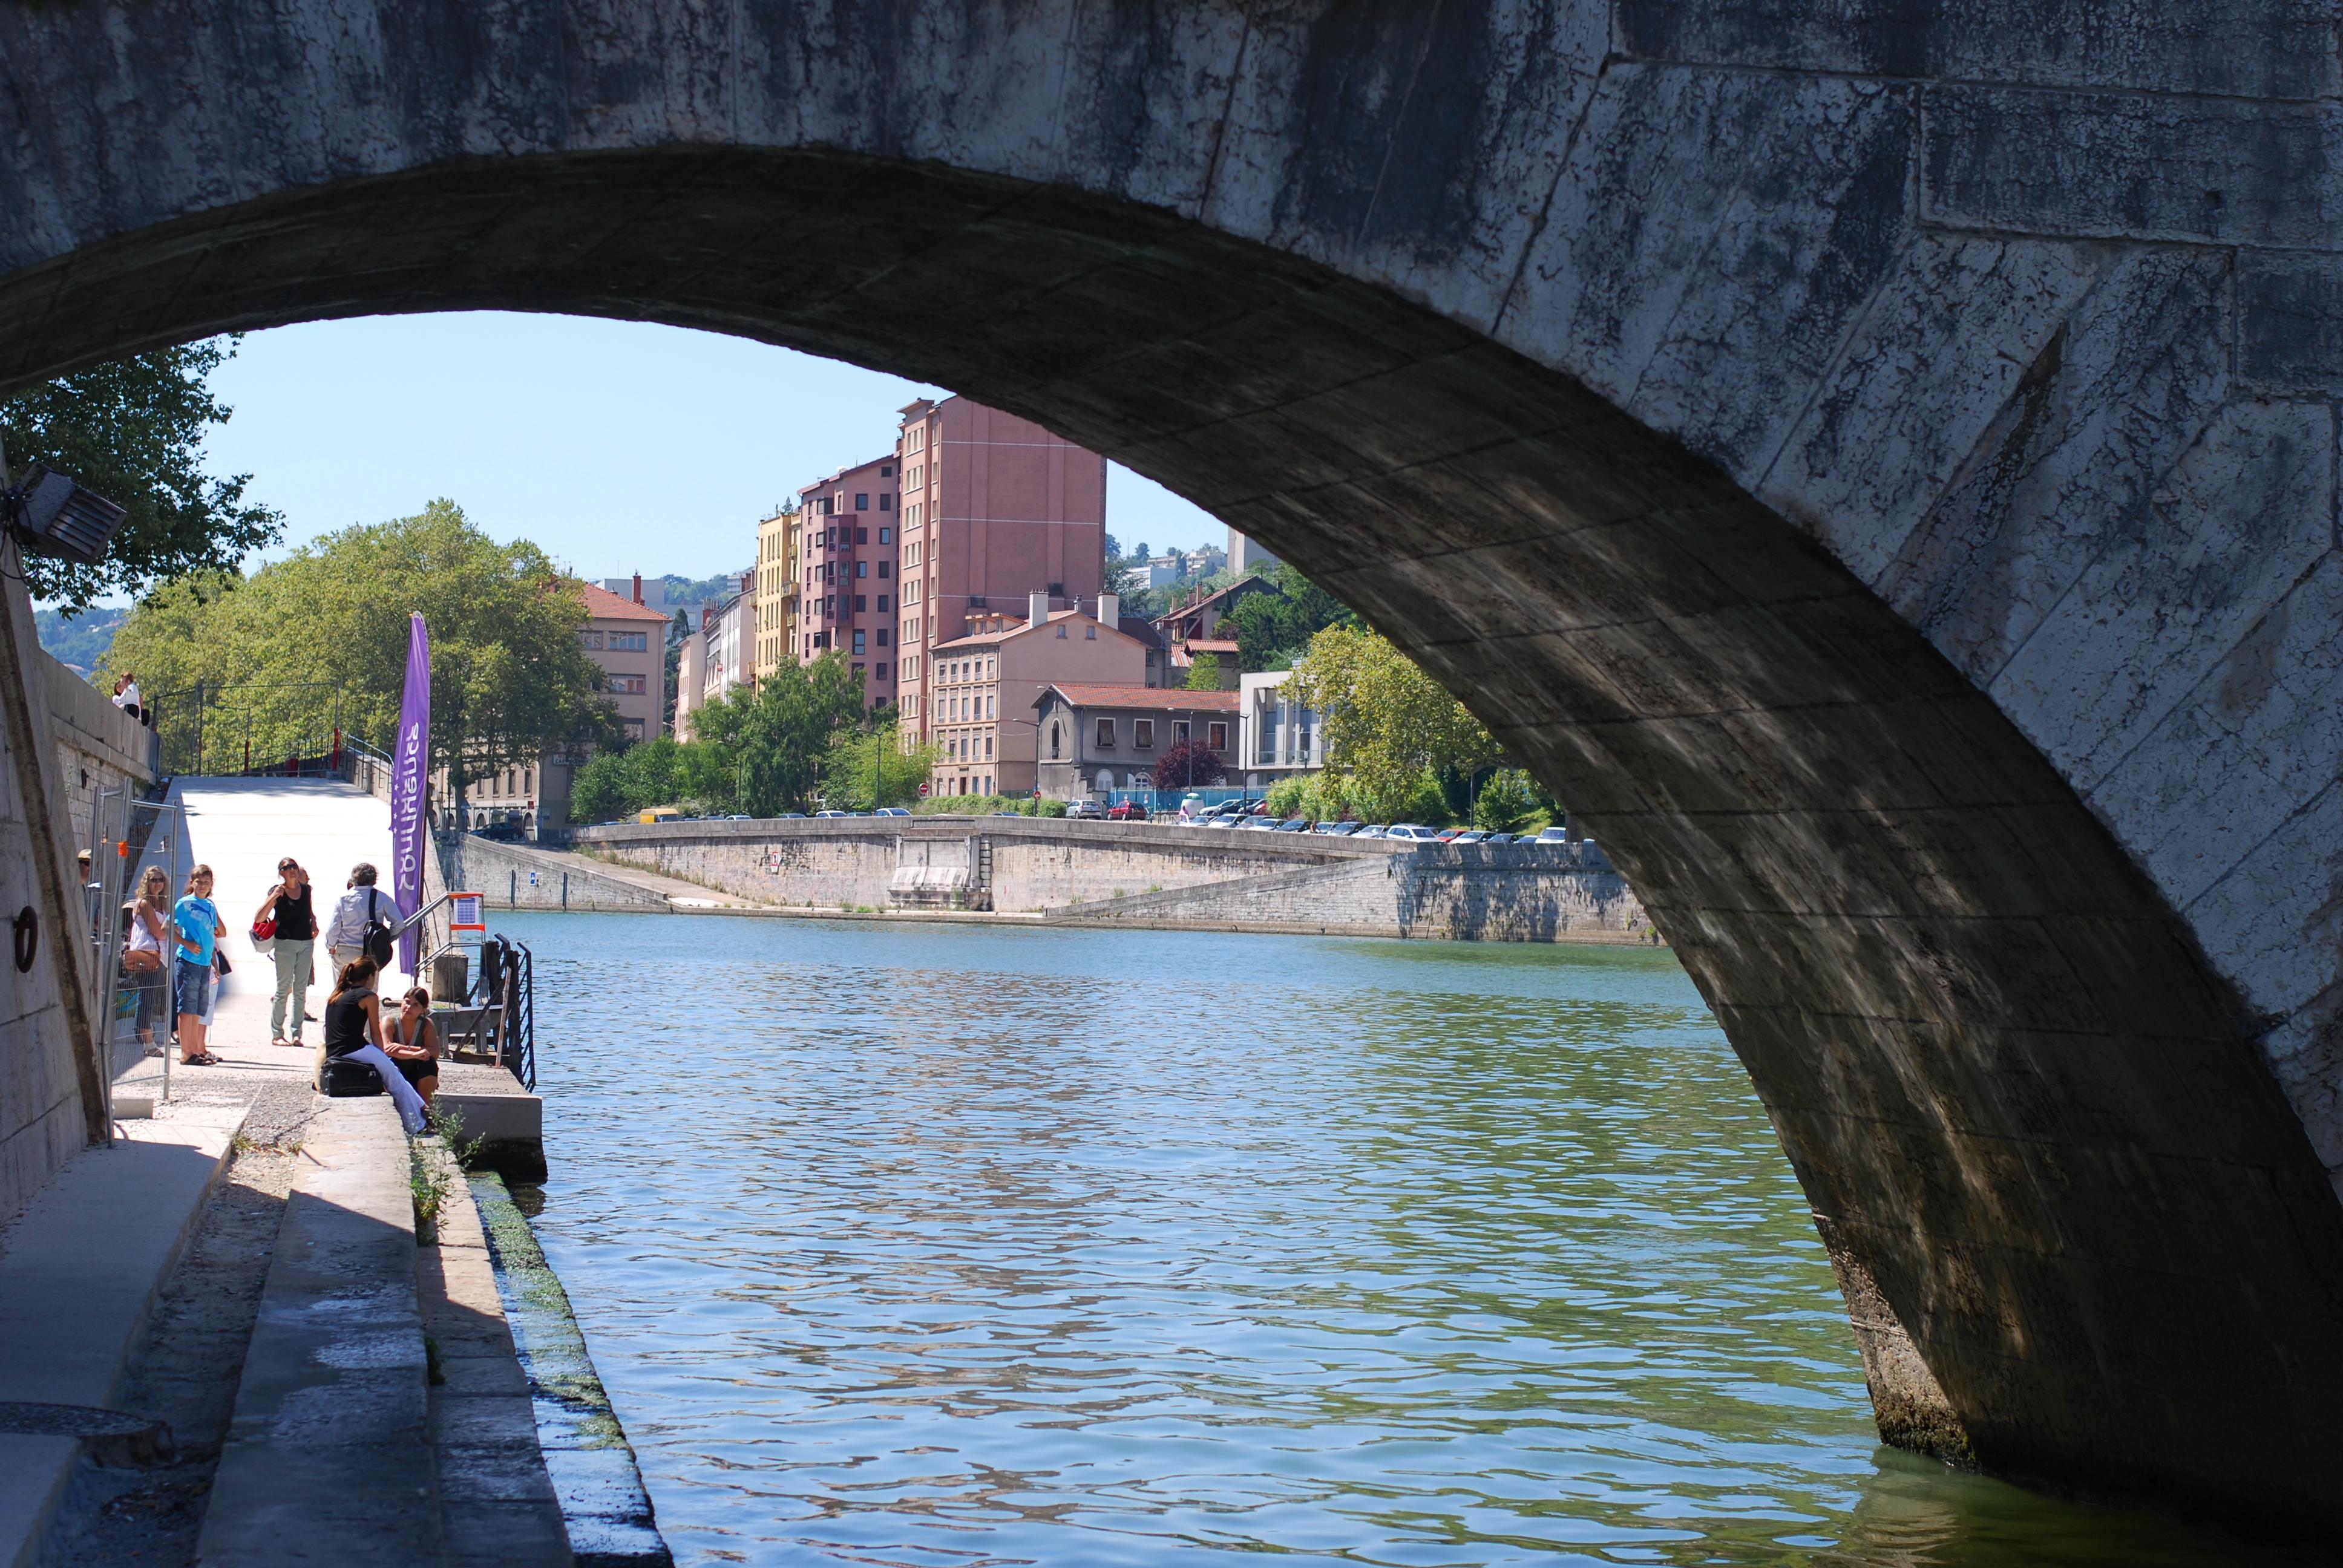 chambray and curls Lyon Riverside under the bridge France Summer Travel